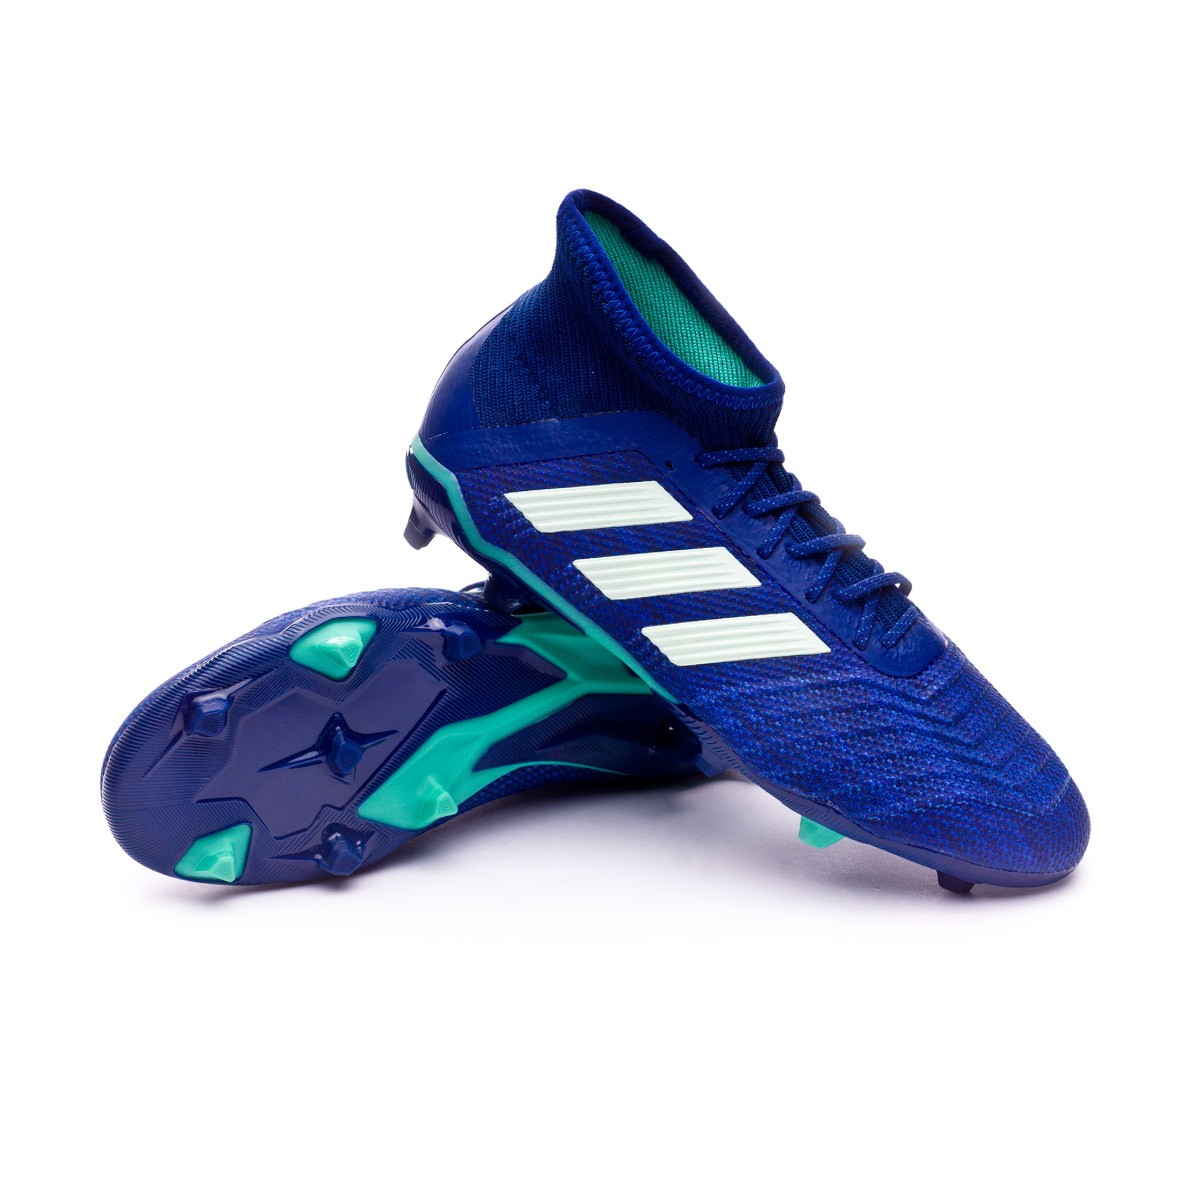 88147aef9 adidas Kids Predator 18.1 FG Football Boots. Unity ink-Aero green-Hi-res ...